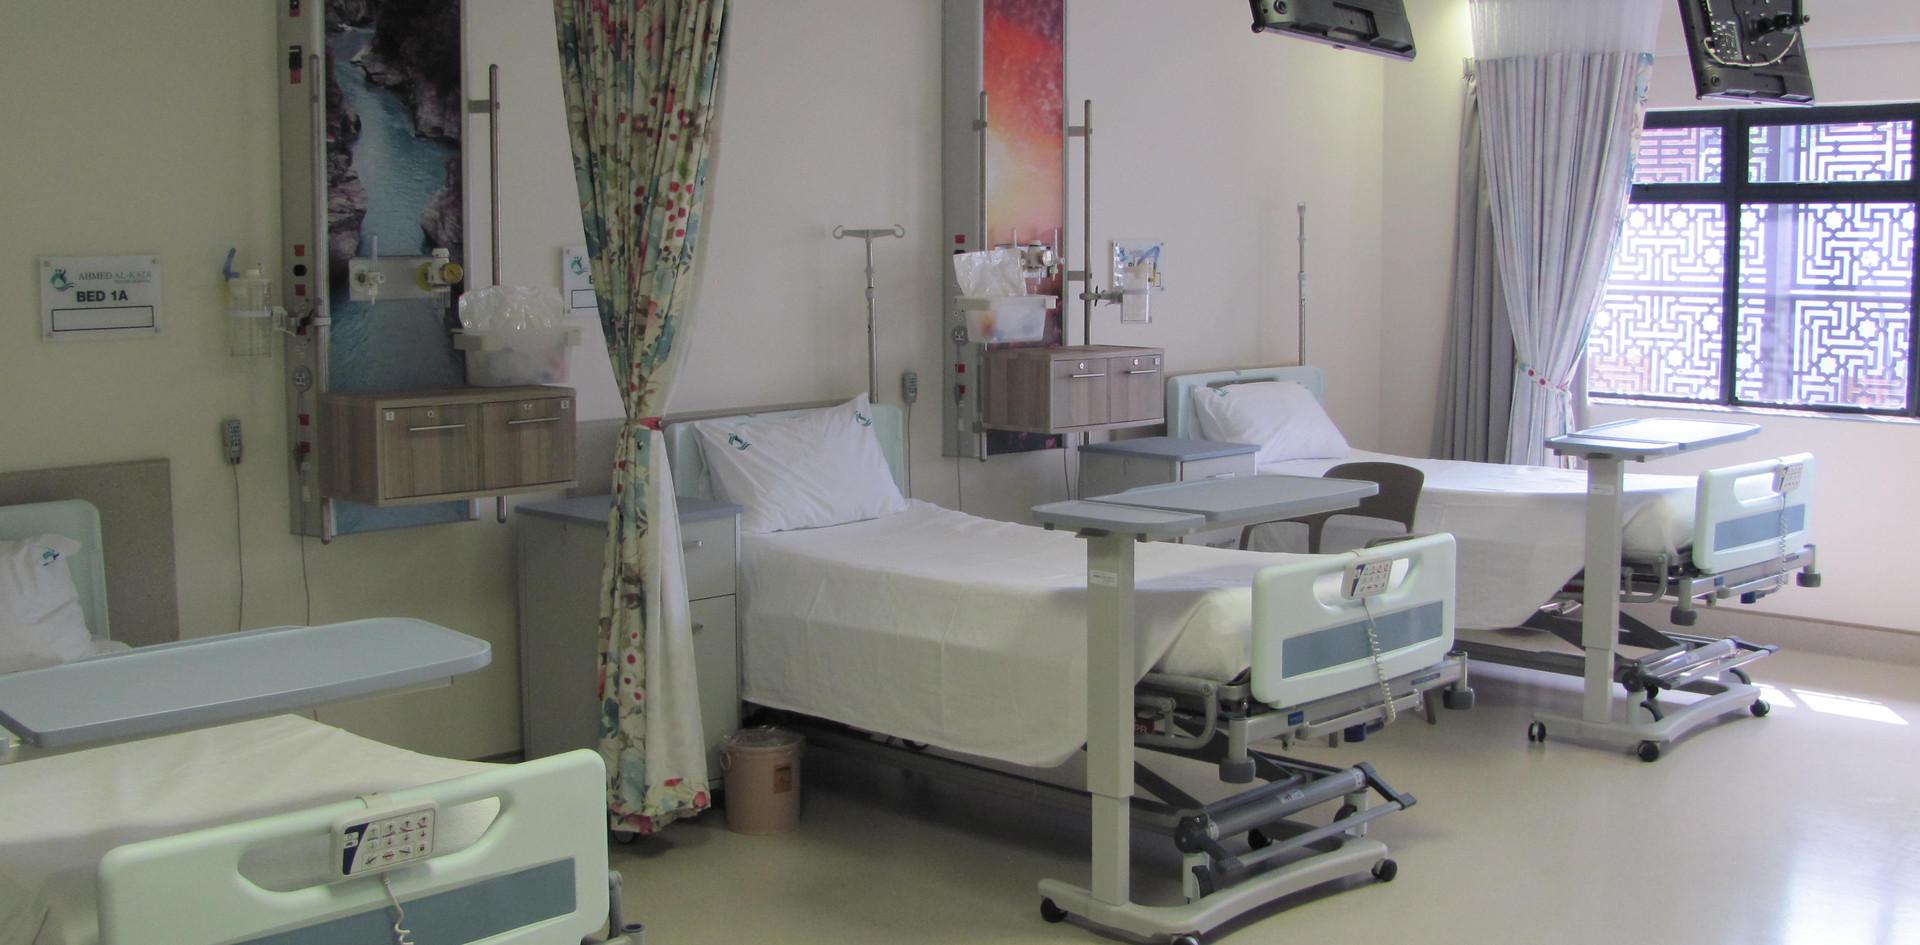 Sergical ward